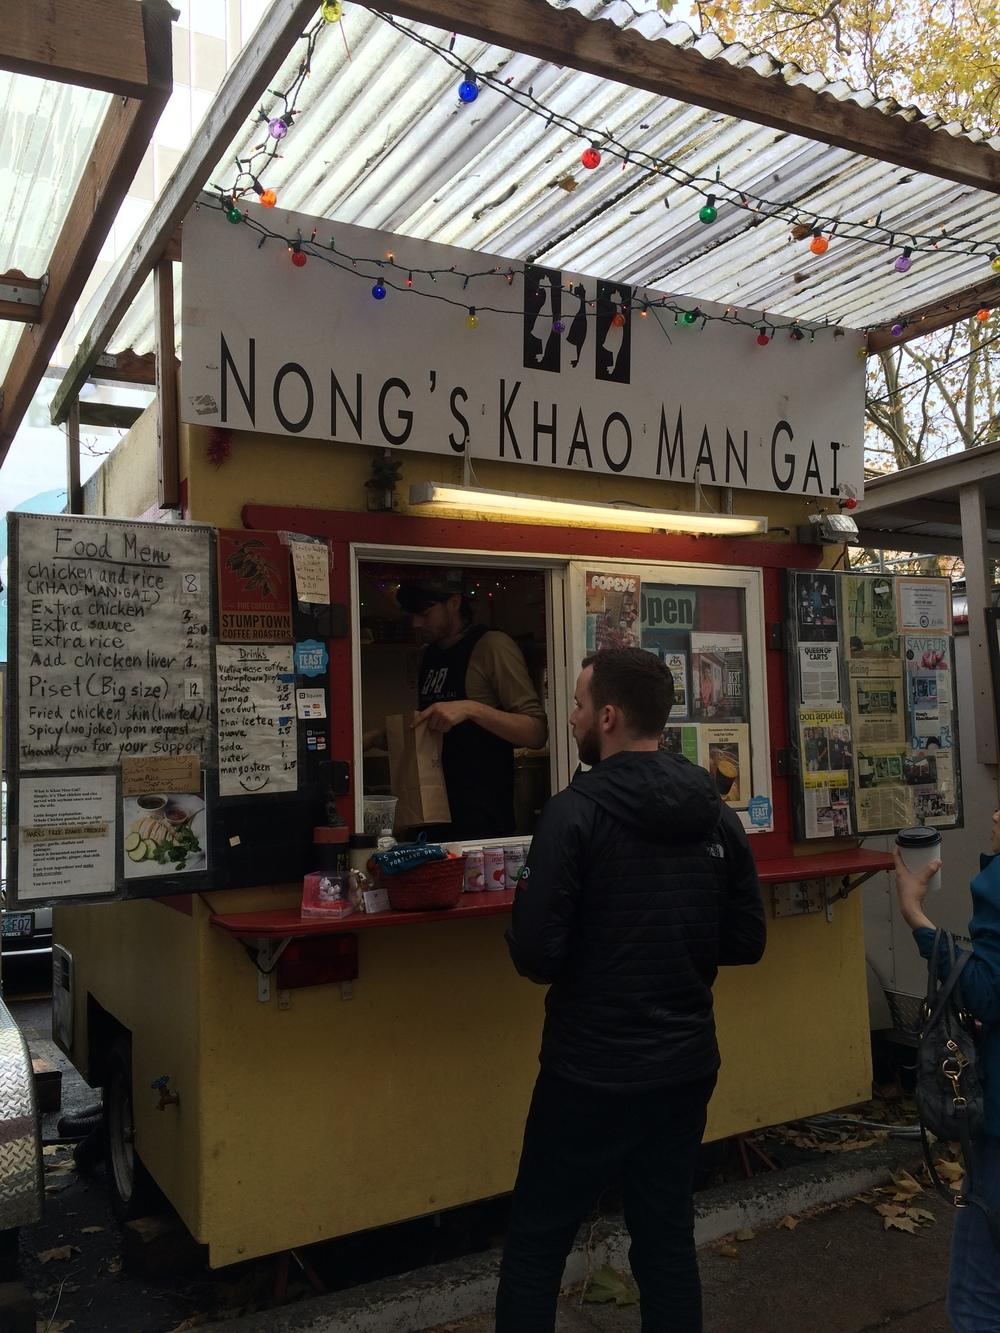 Nong's Khao Man Gai stand